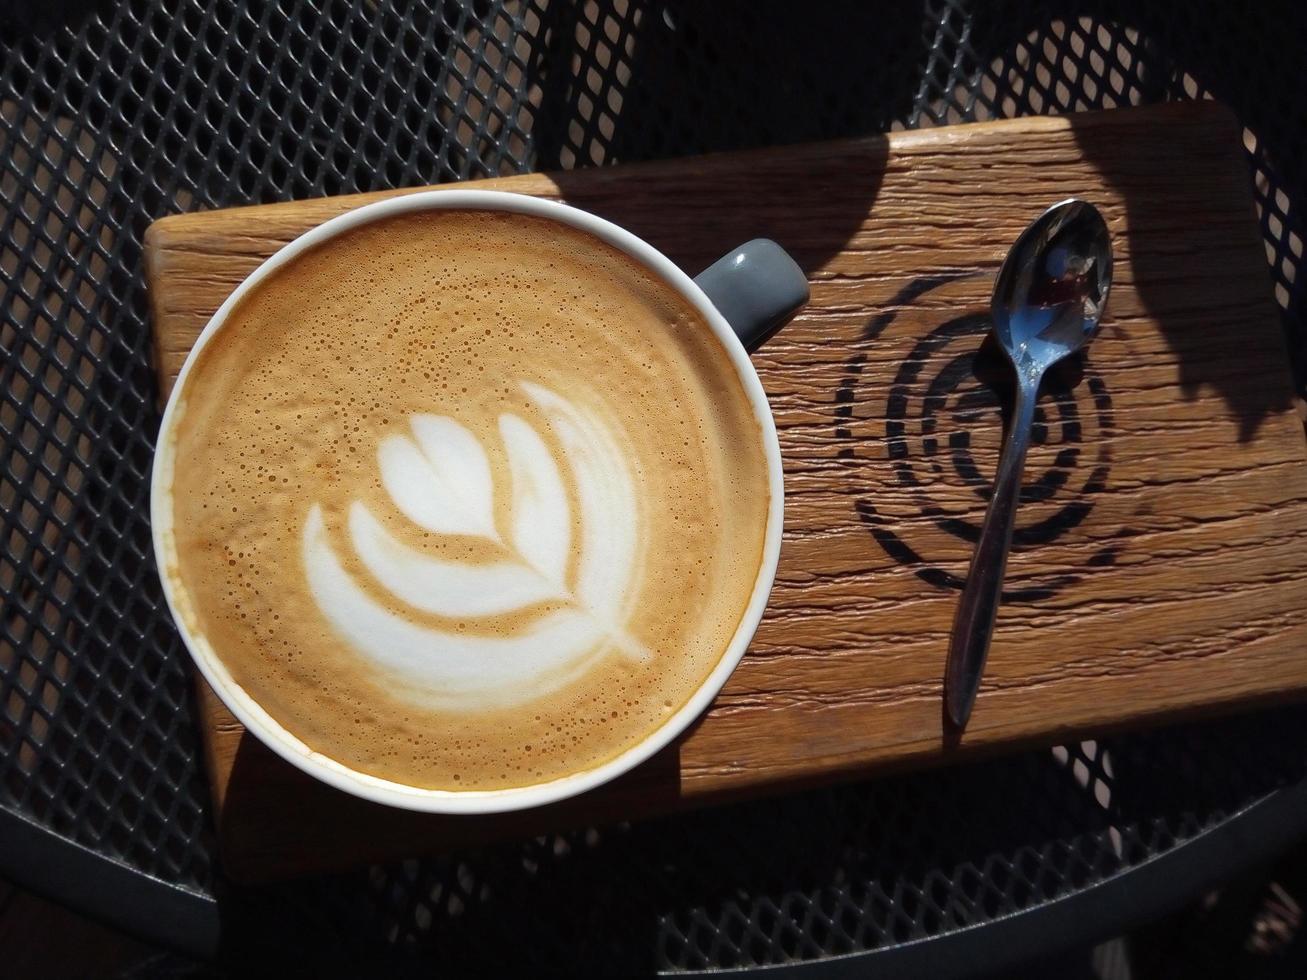 cappuccino ovanifrån utomhus foto